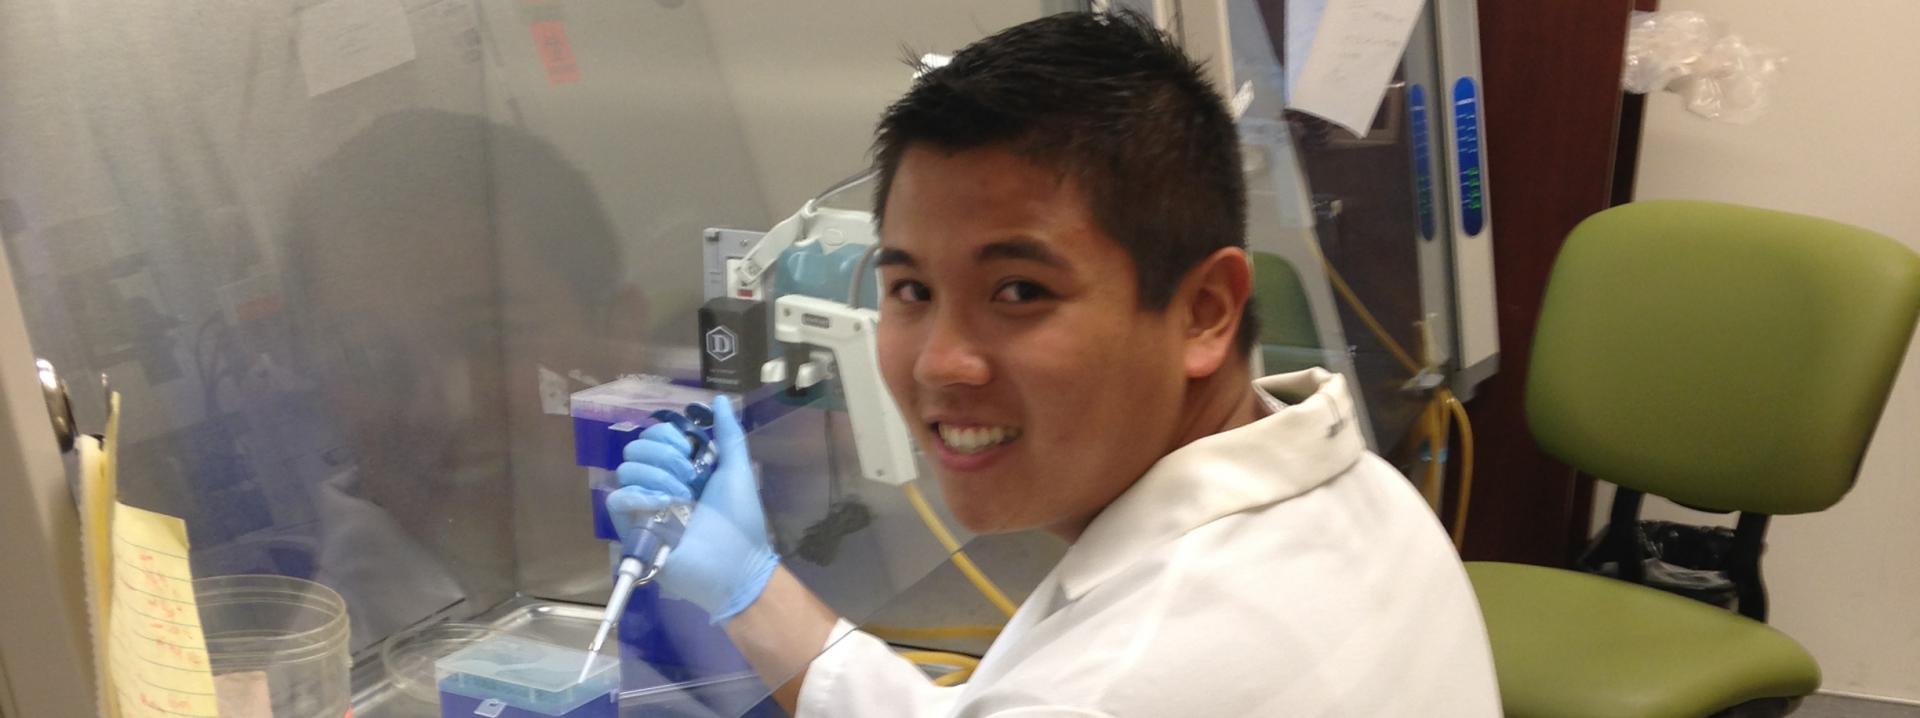 Kwock Chris Im, Keck School of Medicine of USC